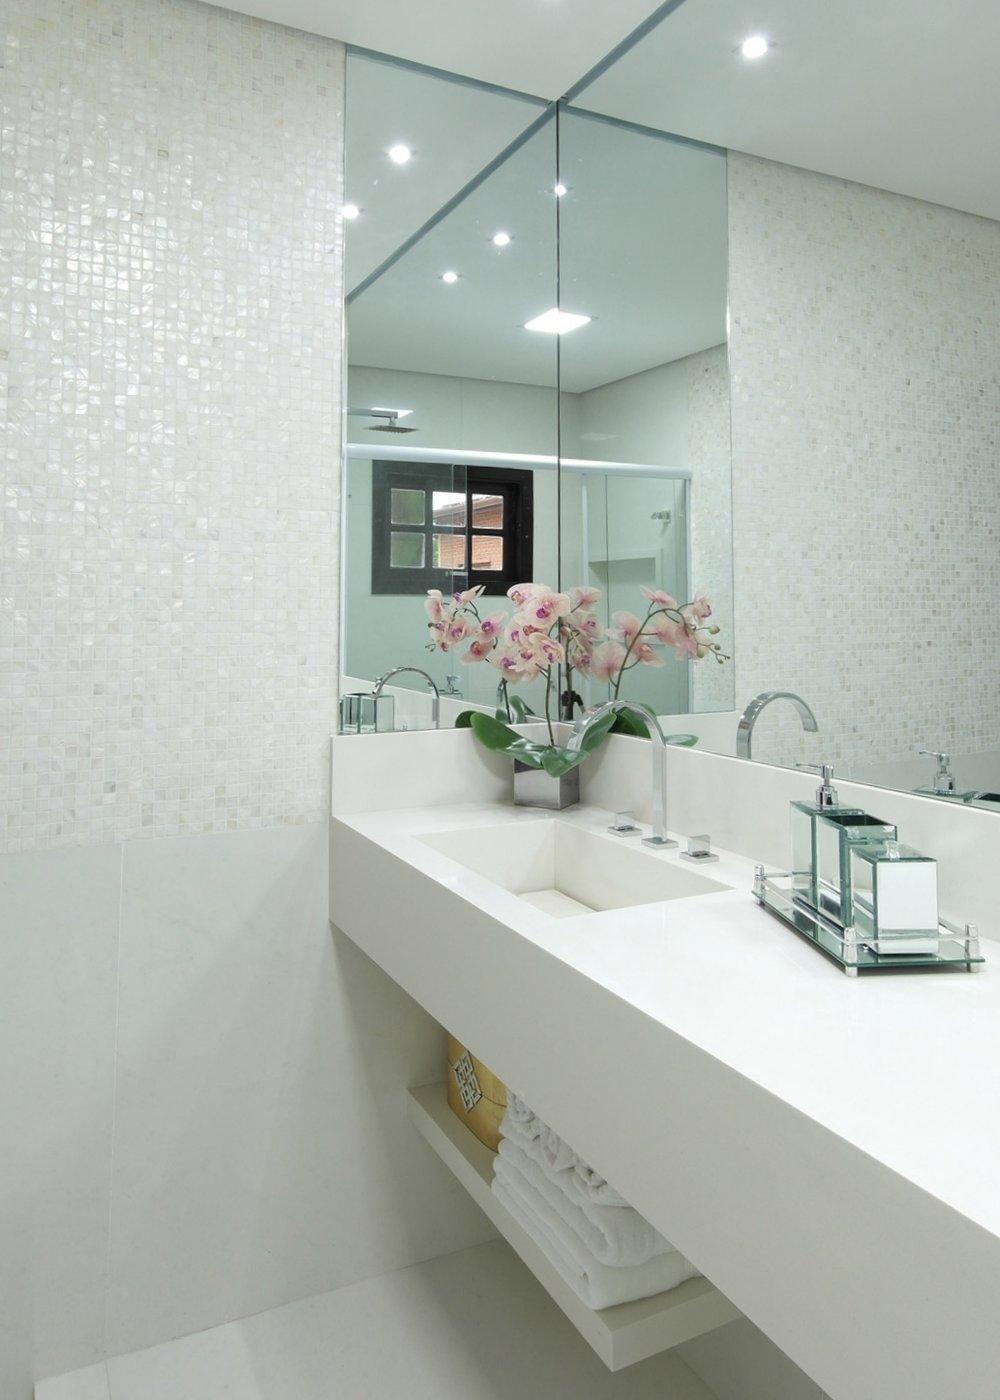 Daniela-Marques-Arquitetura-004-Banheiro-Moderno-Pastilha-Madreperola.jpg